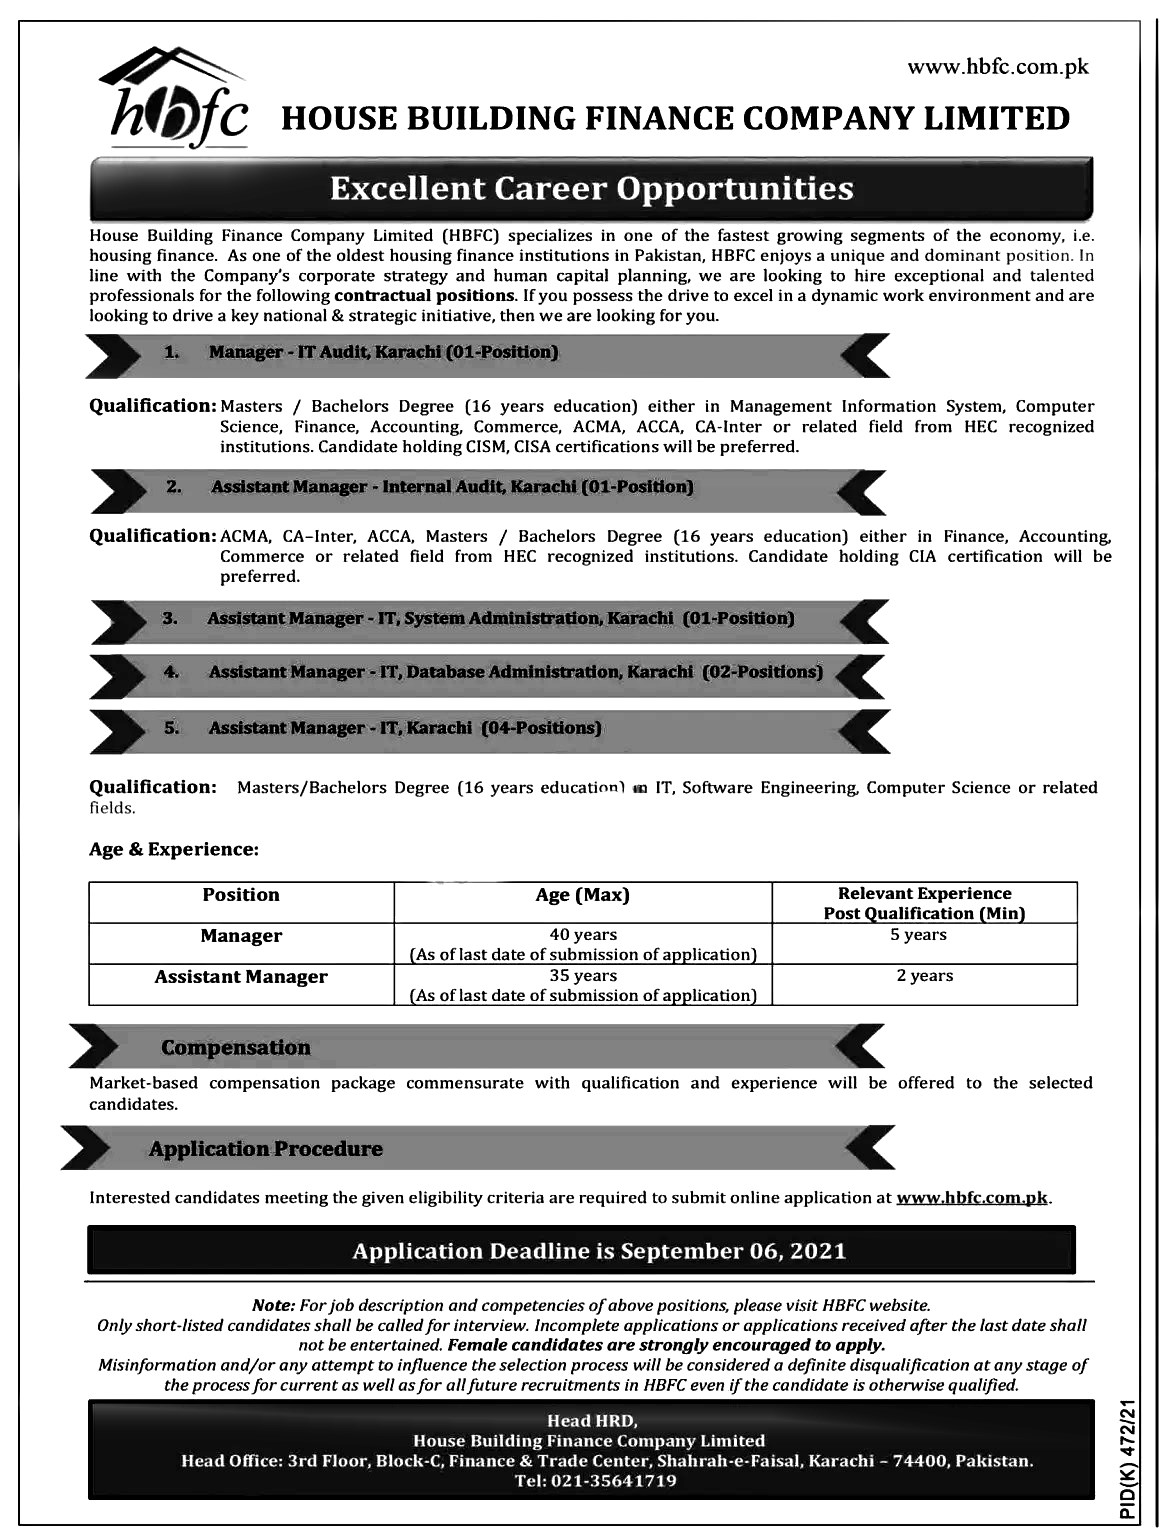 House Building Finance Company HBFC Karachi Jobs 2021